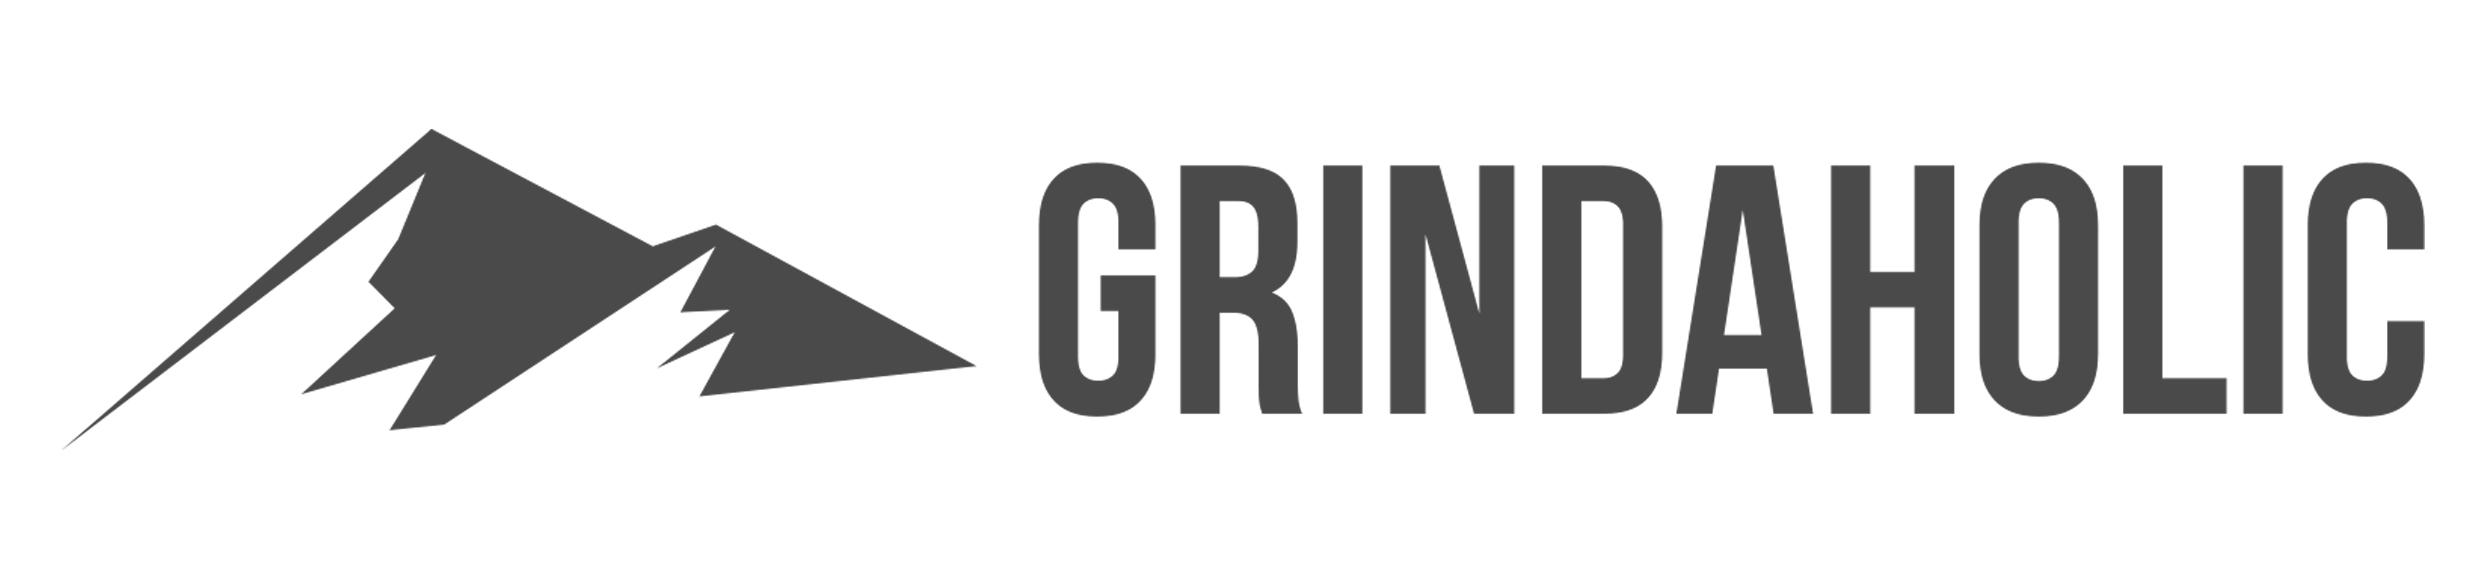 GrindGreyy.jpg